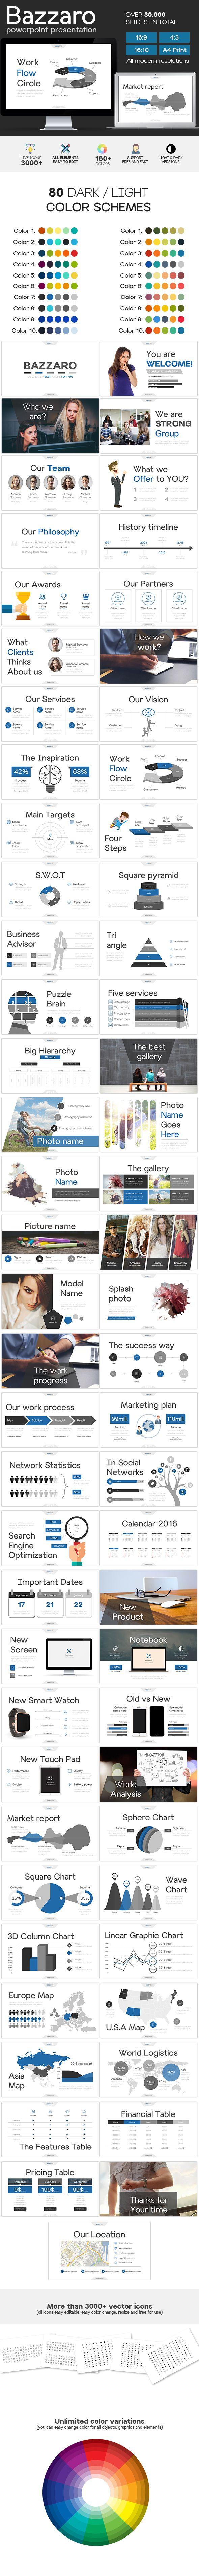 Bazzaro - Multipurpose PowerPoint Template - PowerPoint Templates Presentation Templates